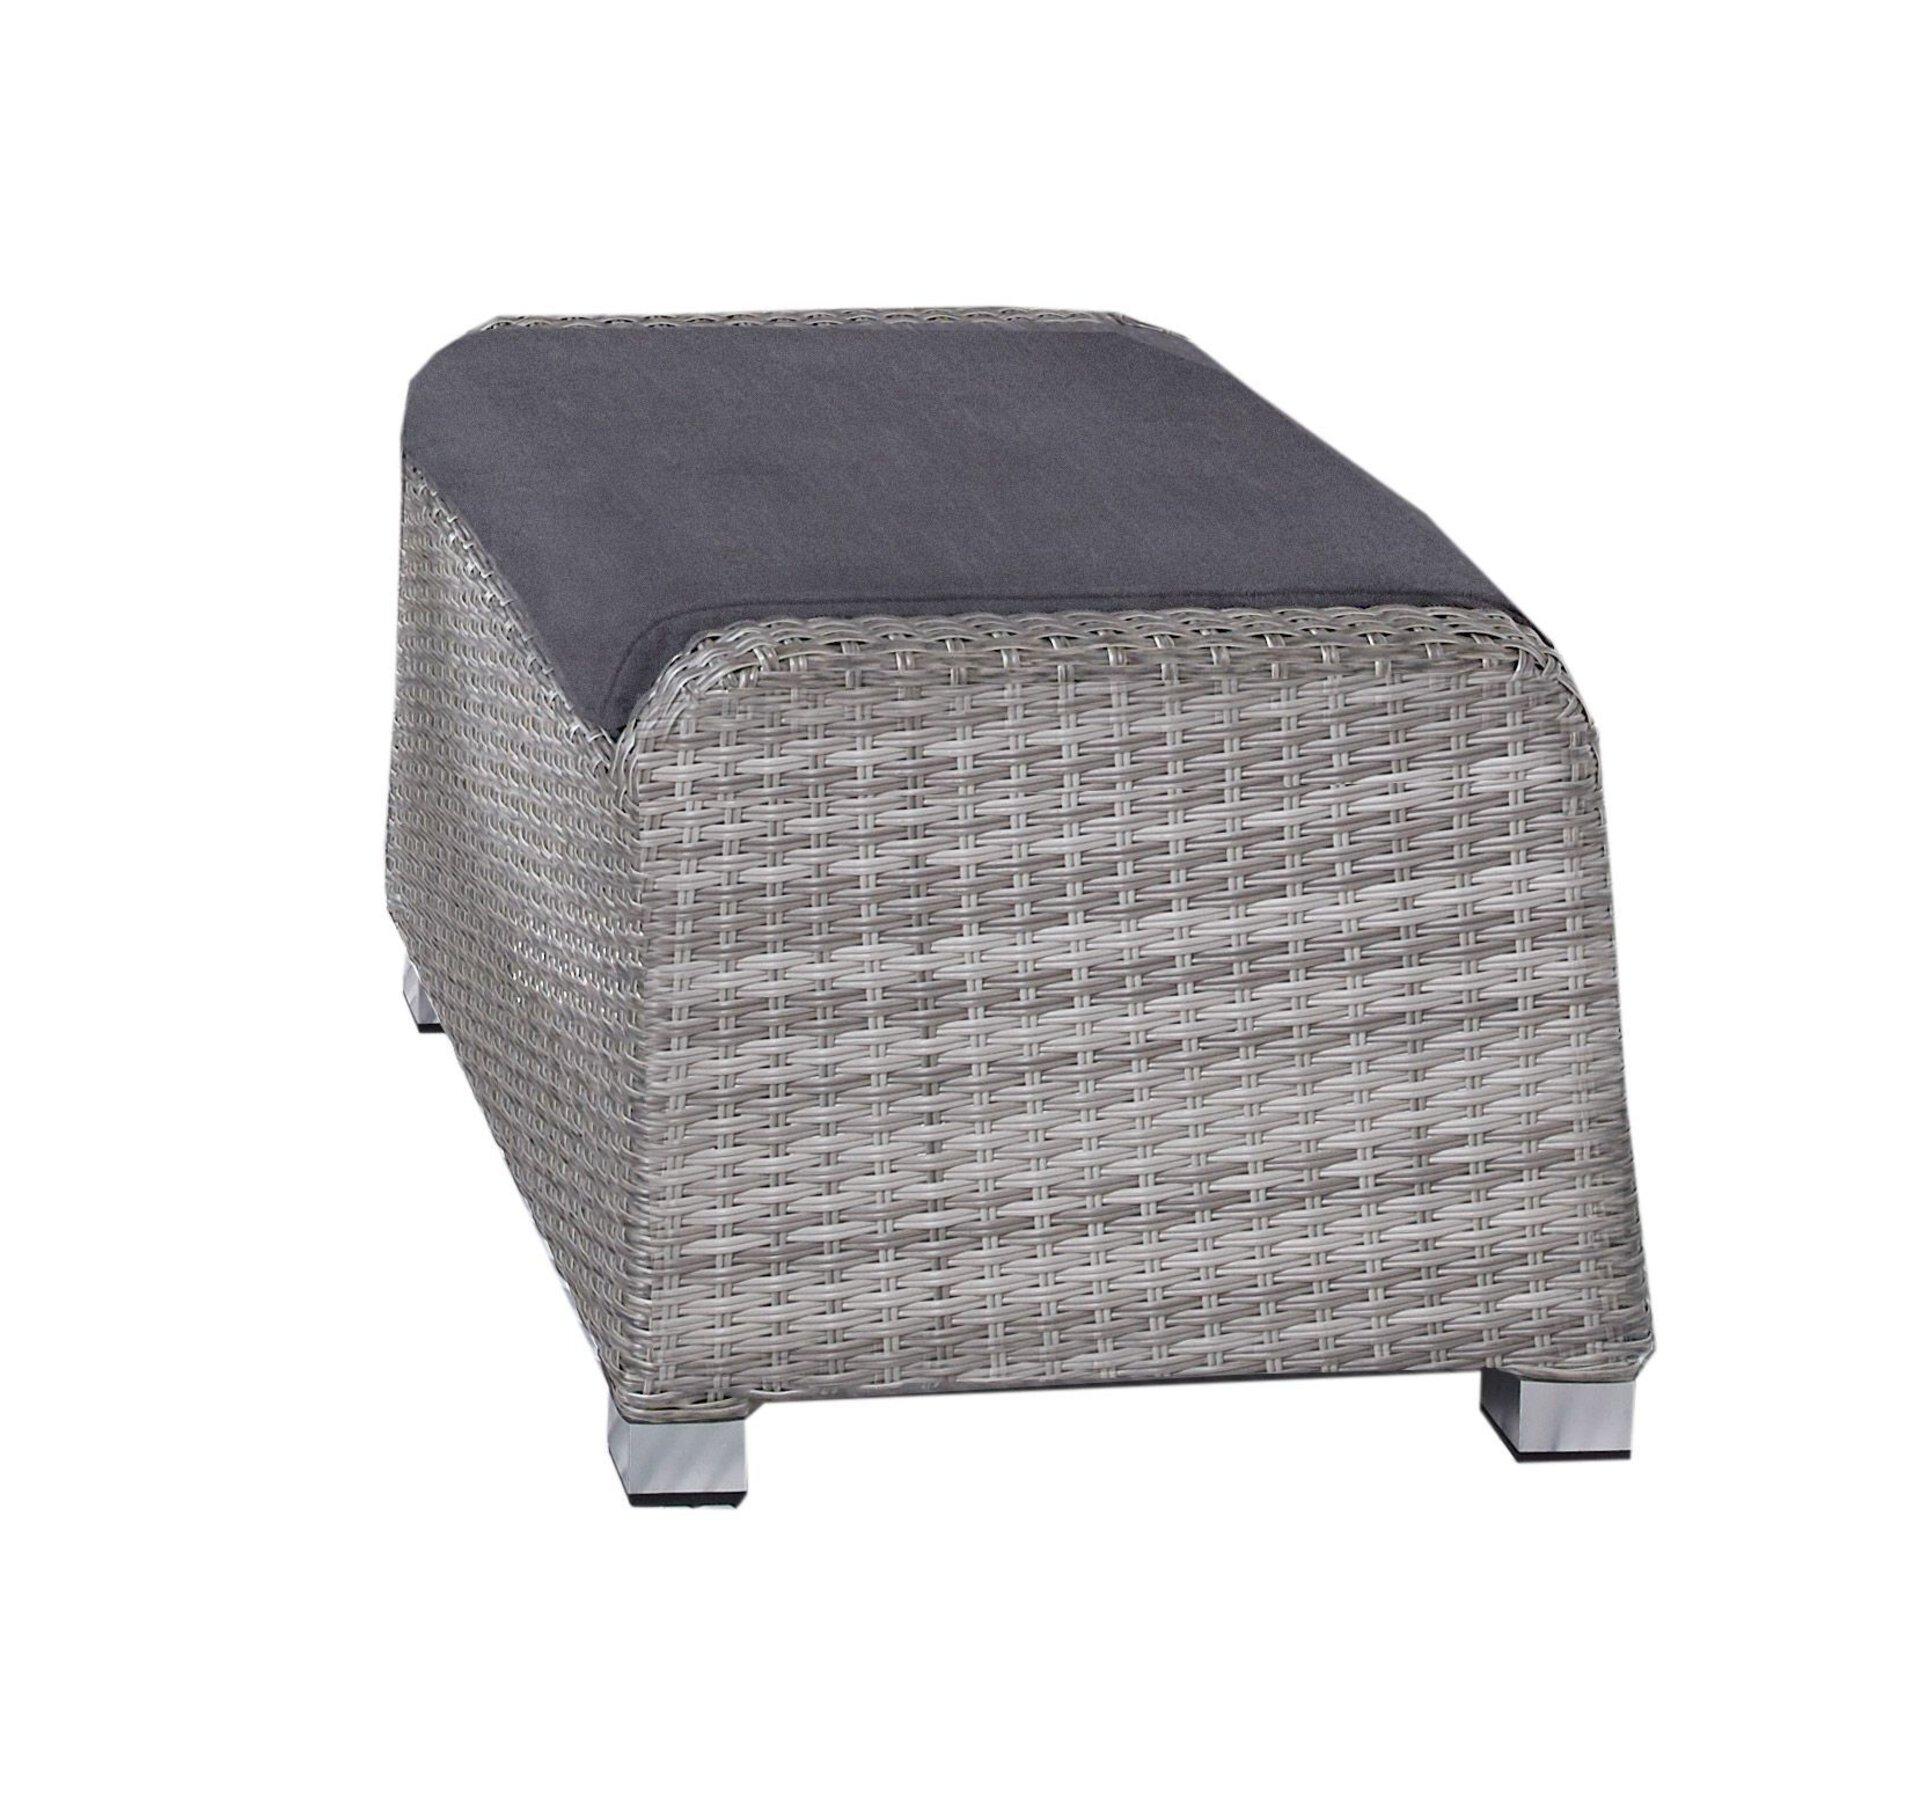 Hocker PARMA Outdoor Textil grau 55 x 43 x 71 cm